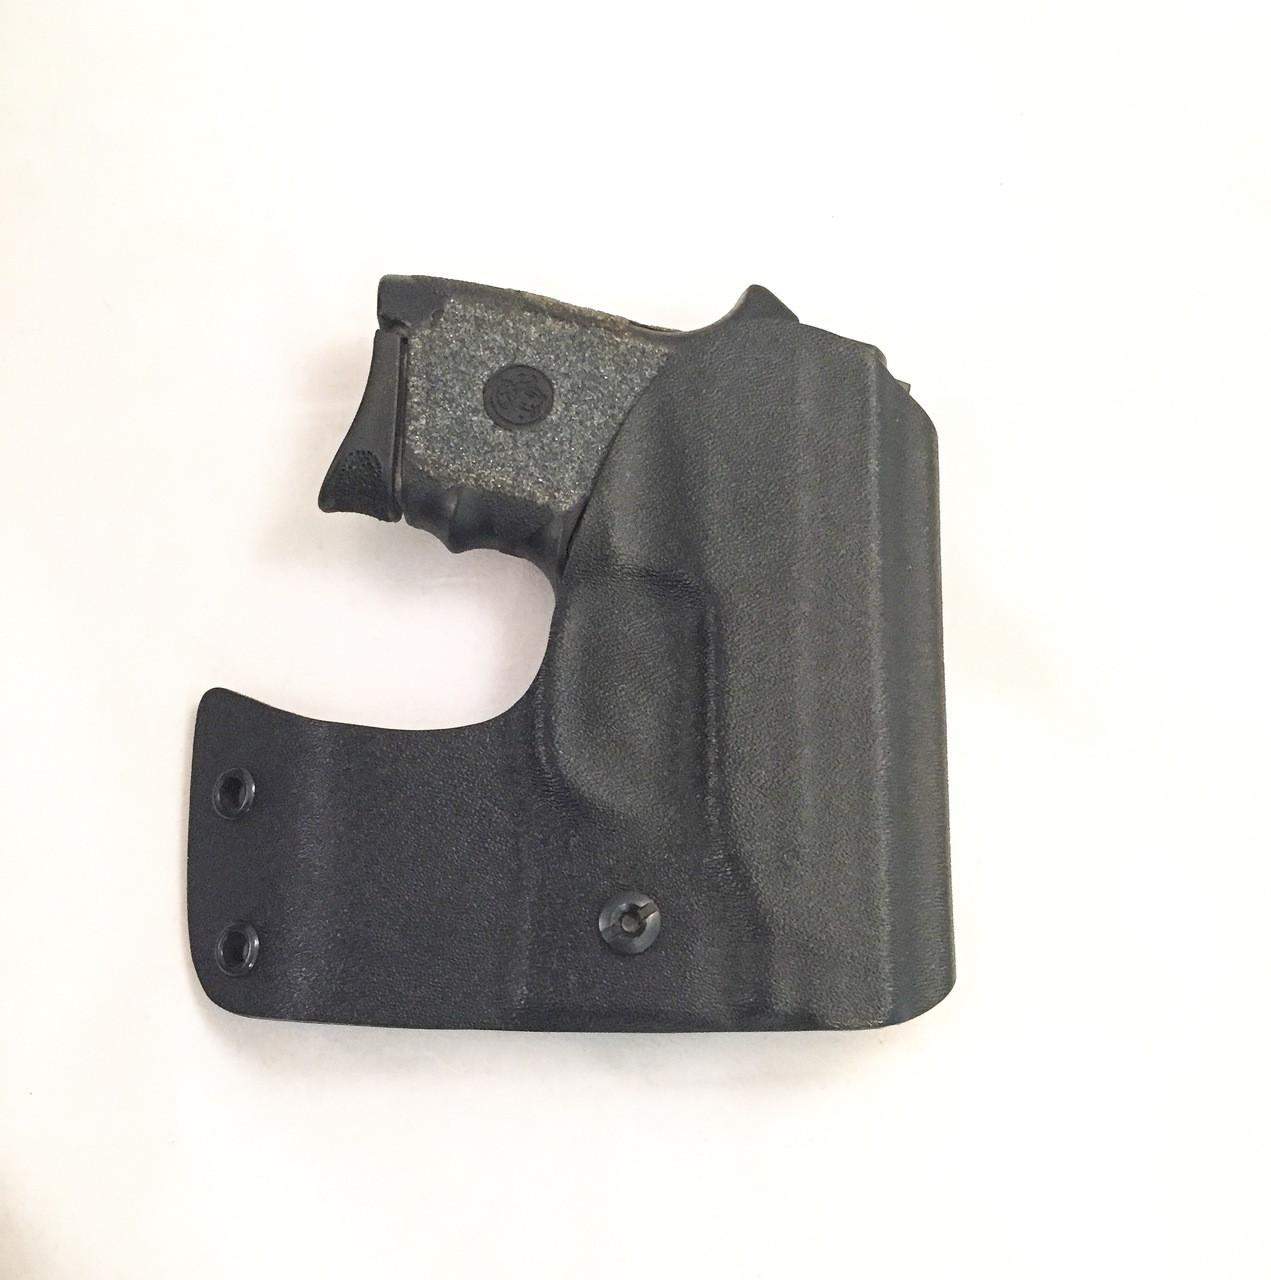 Kydex Pocket Holster for Ruger LCP II Retention Adj Hunting